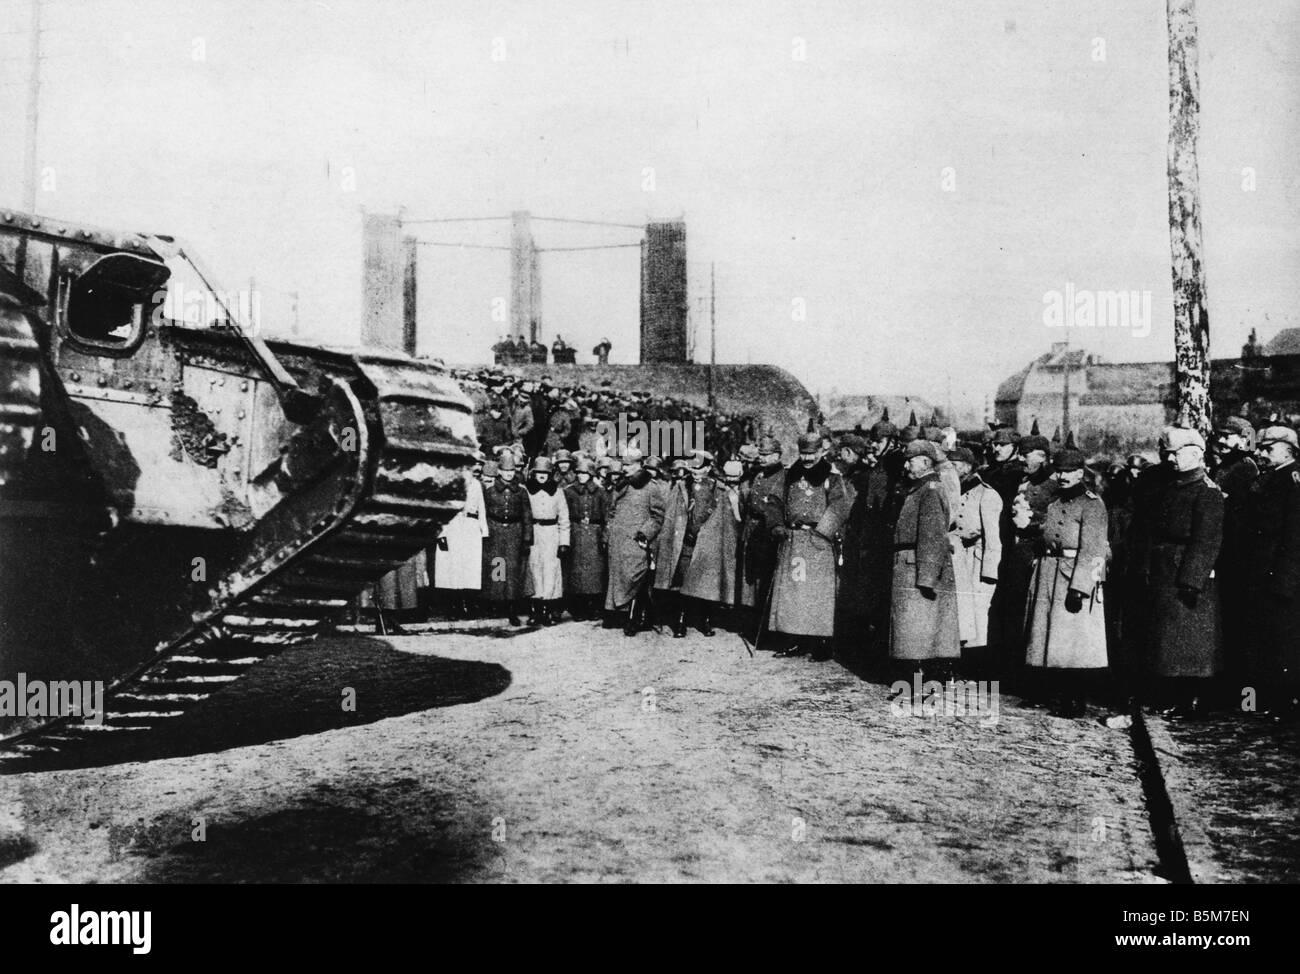 1 W46 F1917 17 E Wilhelm II inspects war loot Photo Wilhelm II German emperor 1888 1918 1859 1941 During World War - Stock Image